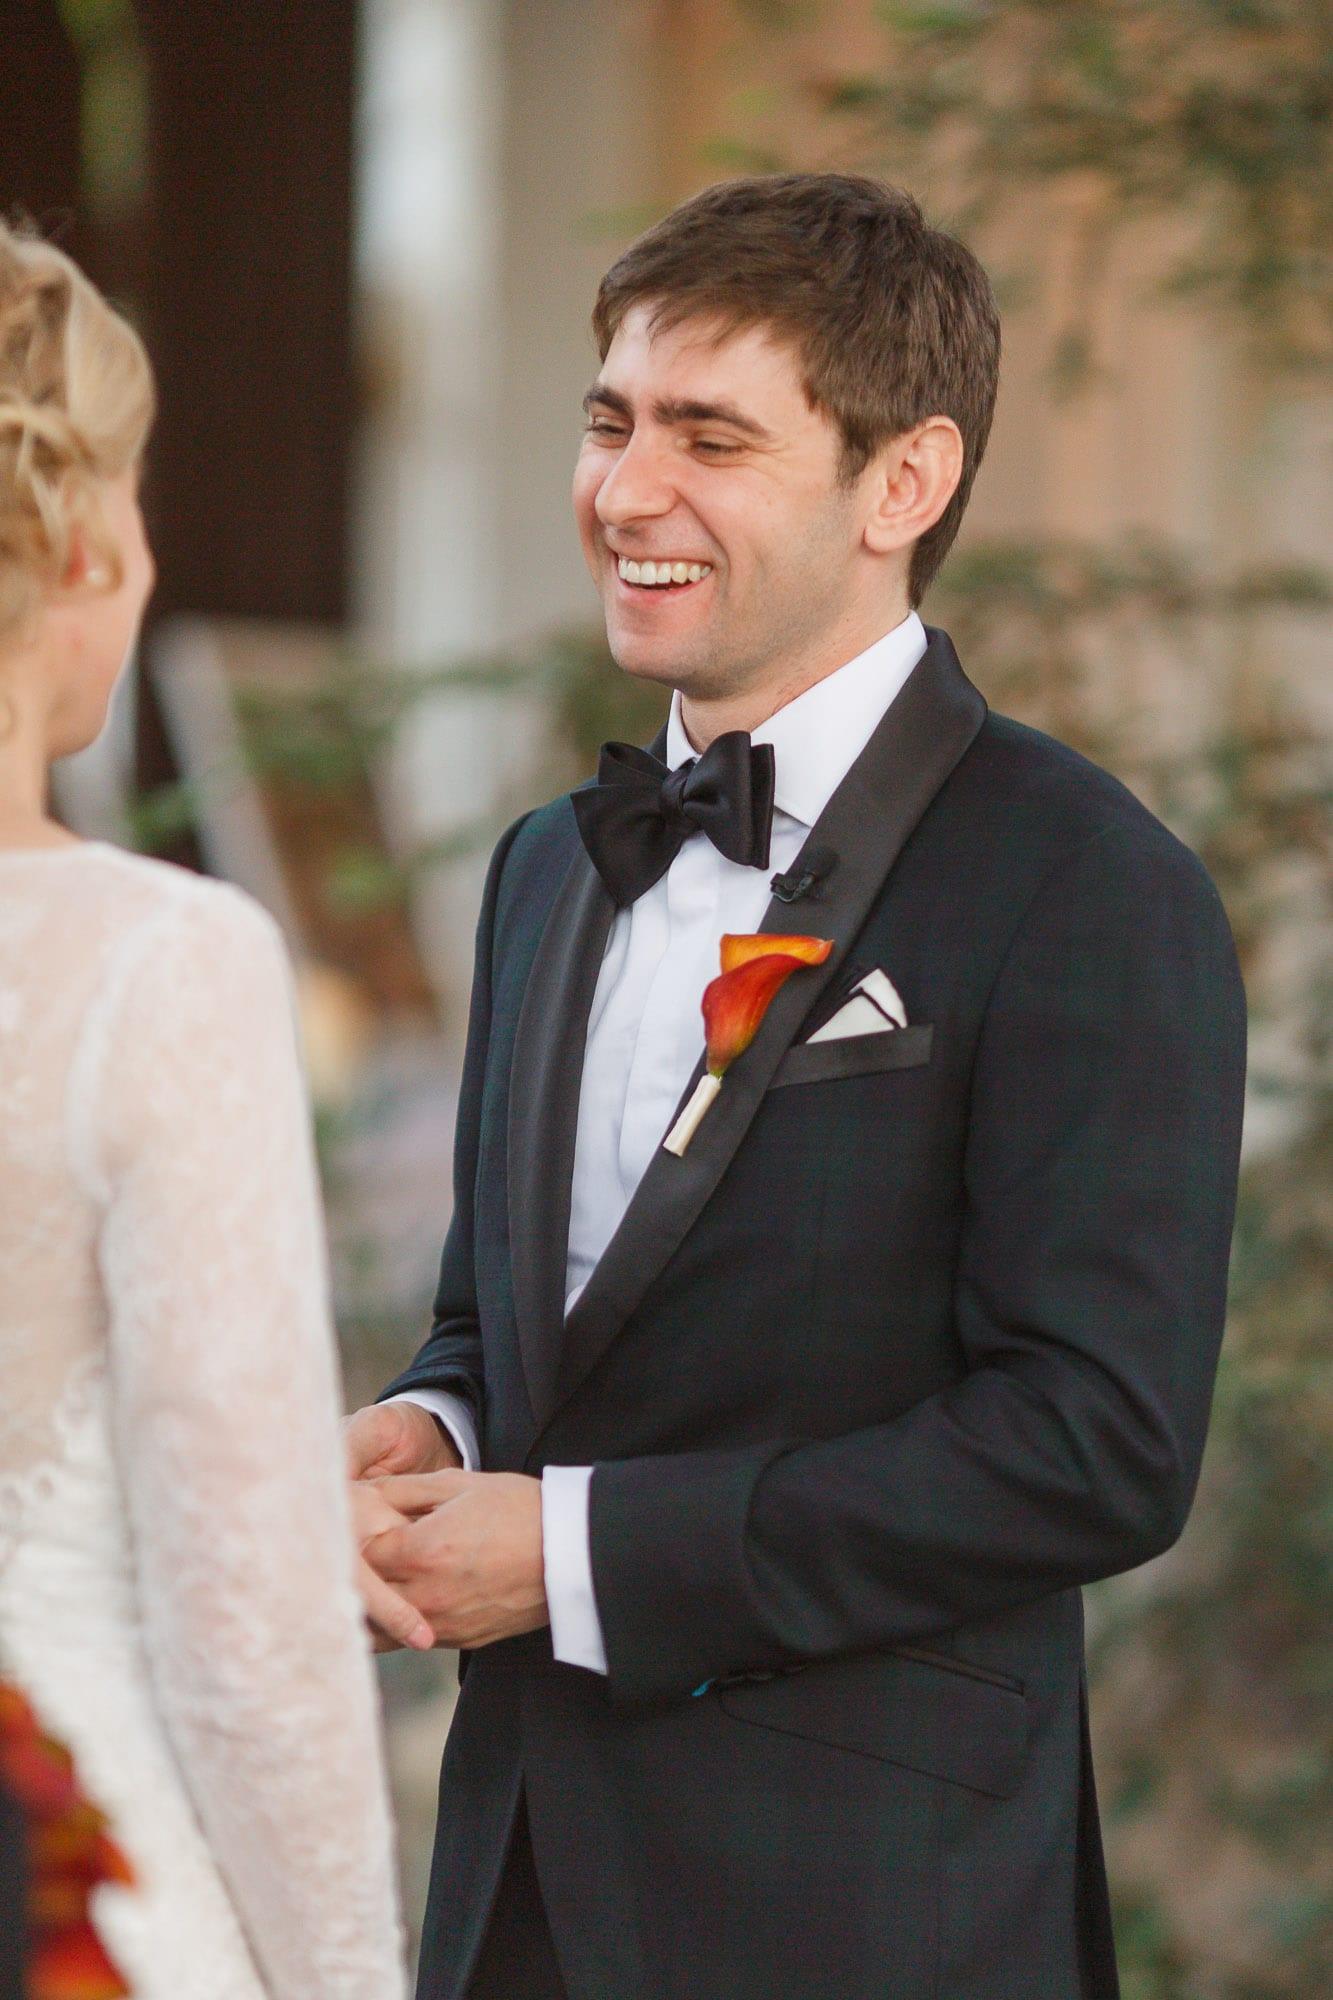 051_Alan_and_Heidi_Los_Angeles_Equestrian_Center_Wedding